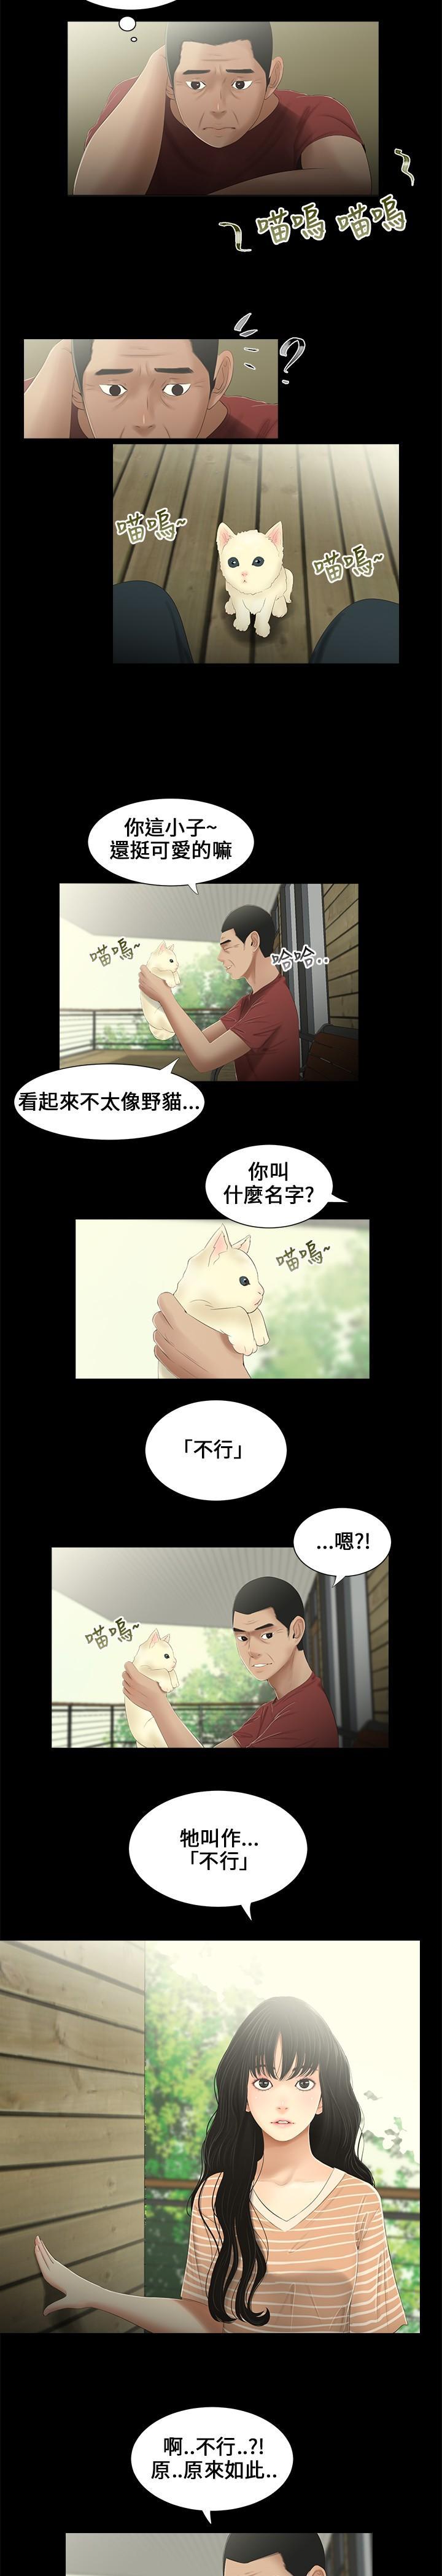 Three sisters 三姐妹Ch.13~19 (Chinese)中文 17